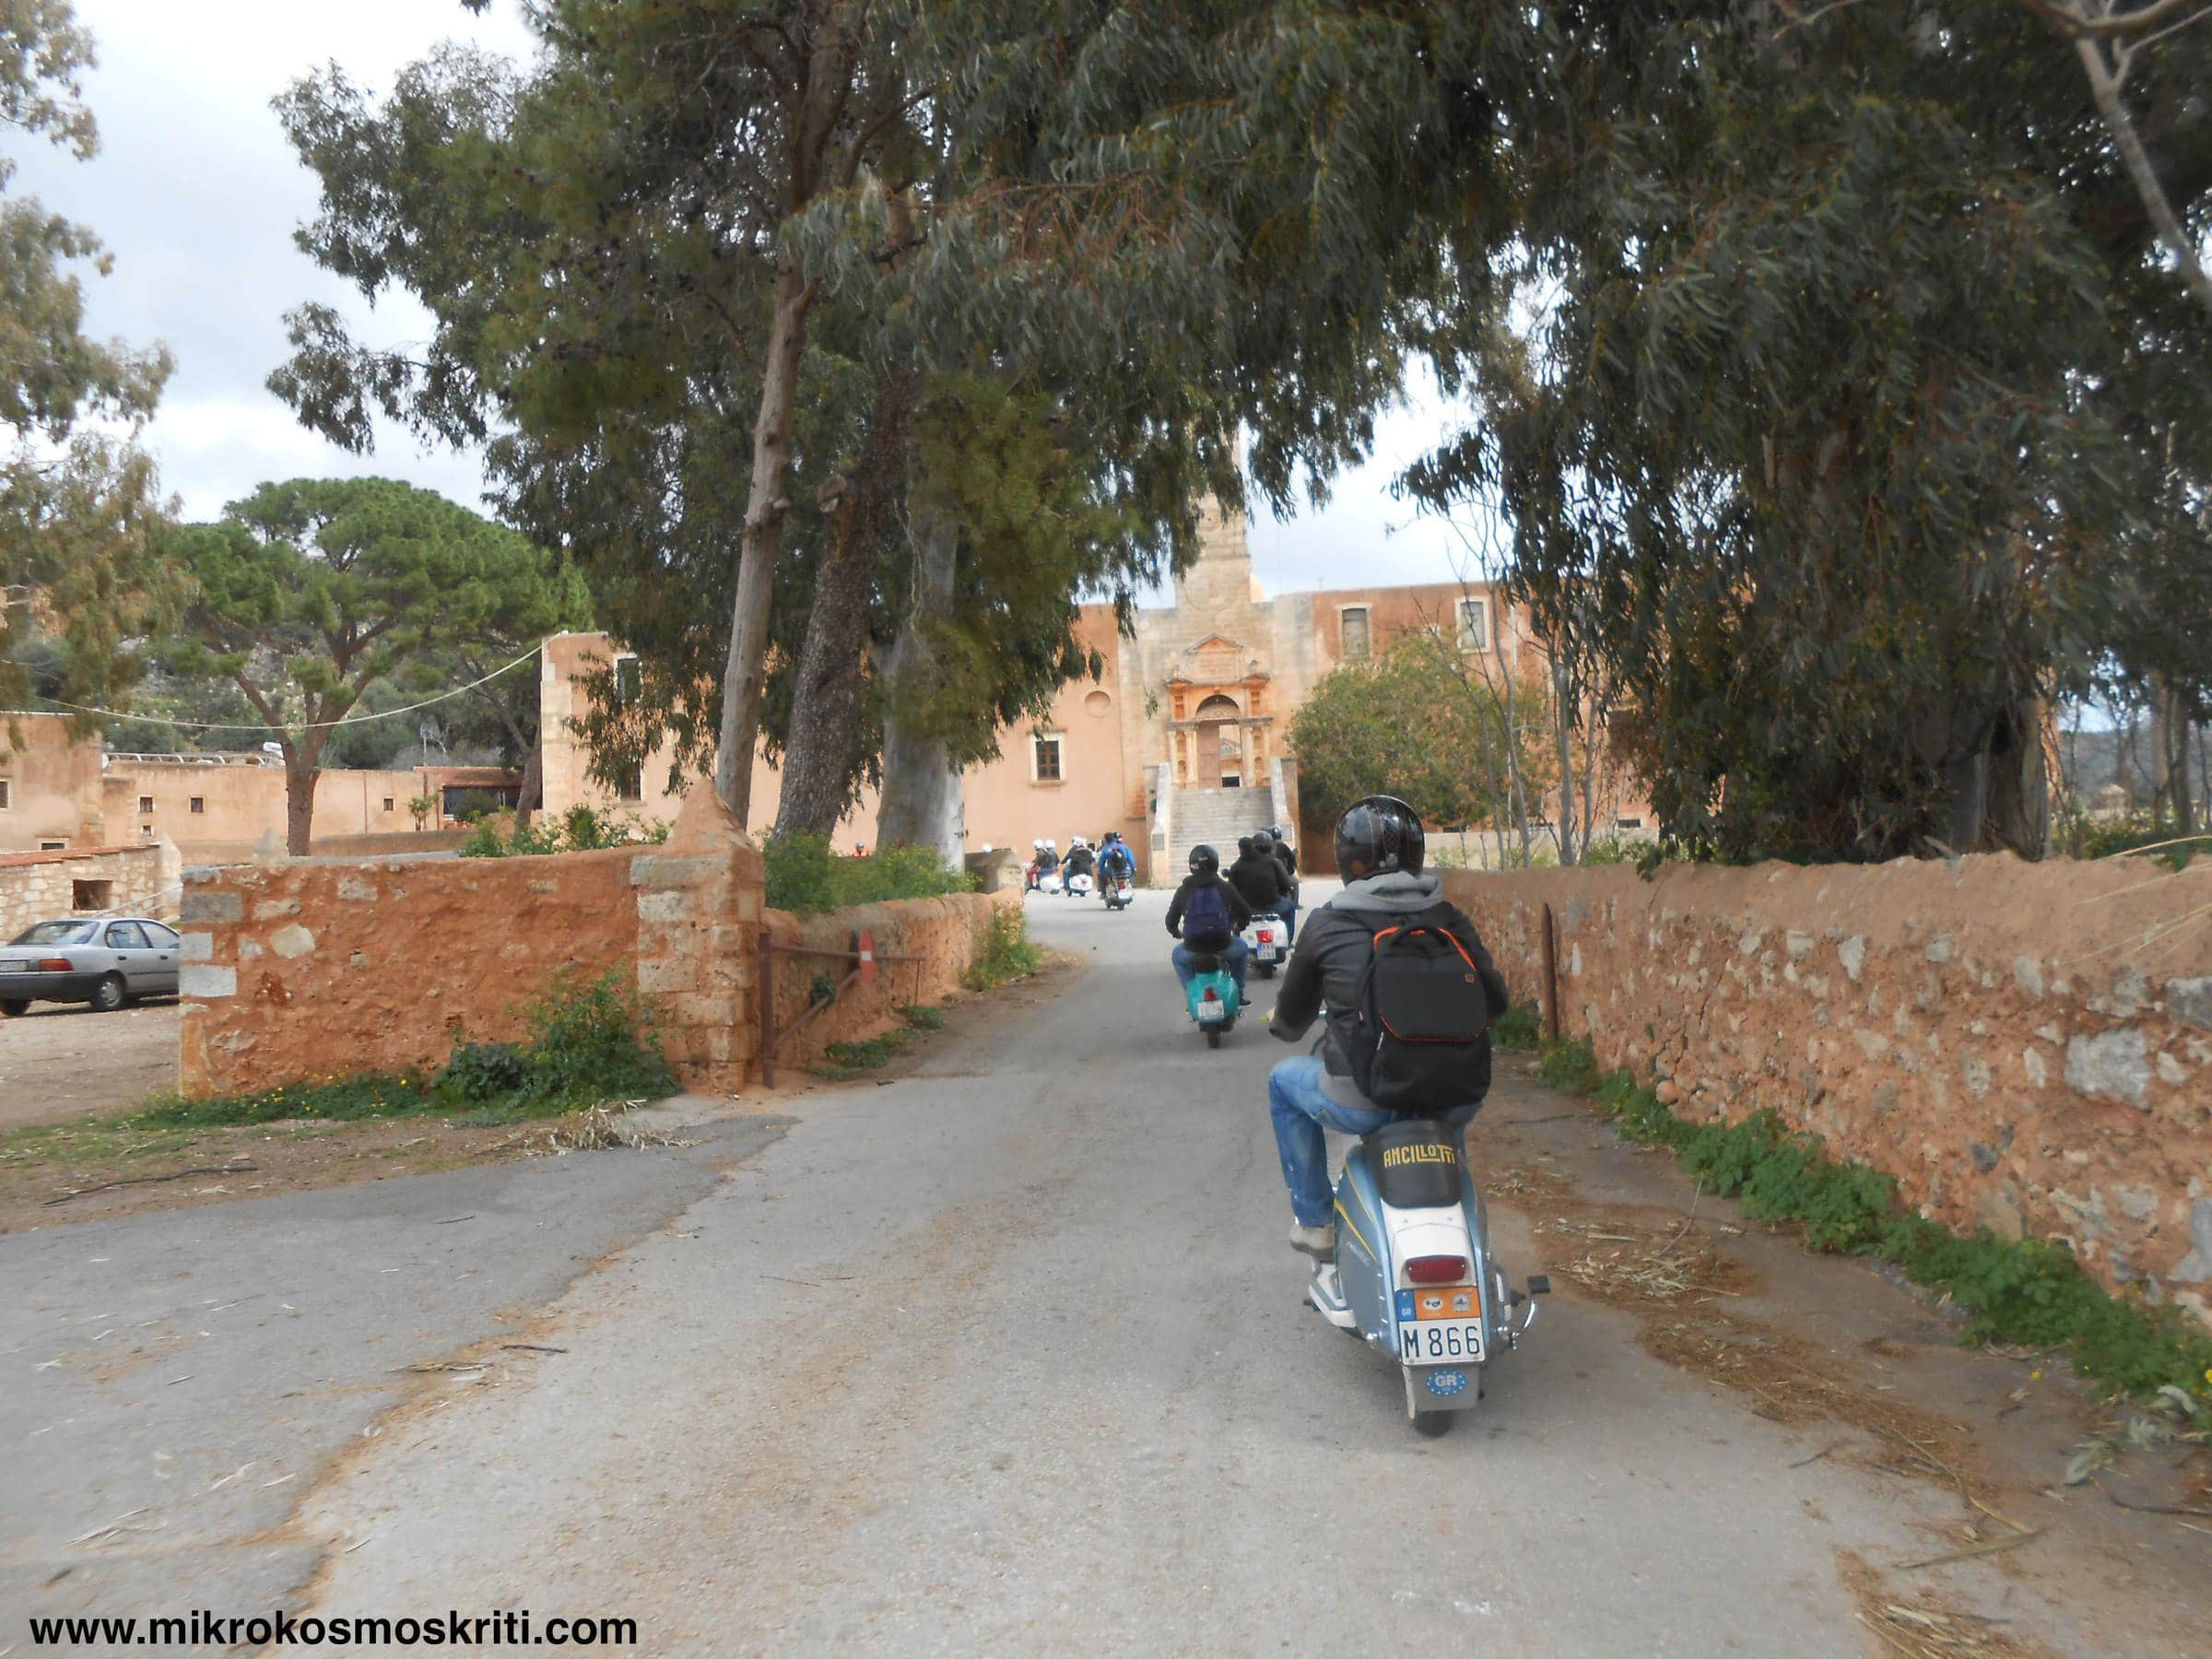 Vespa tour ad Agia Triada